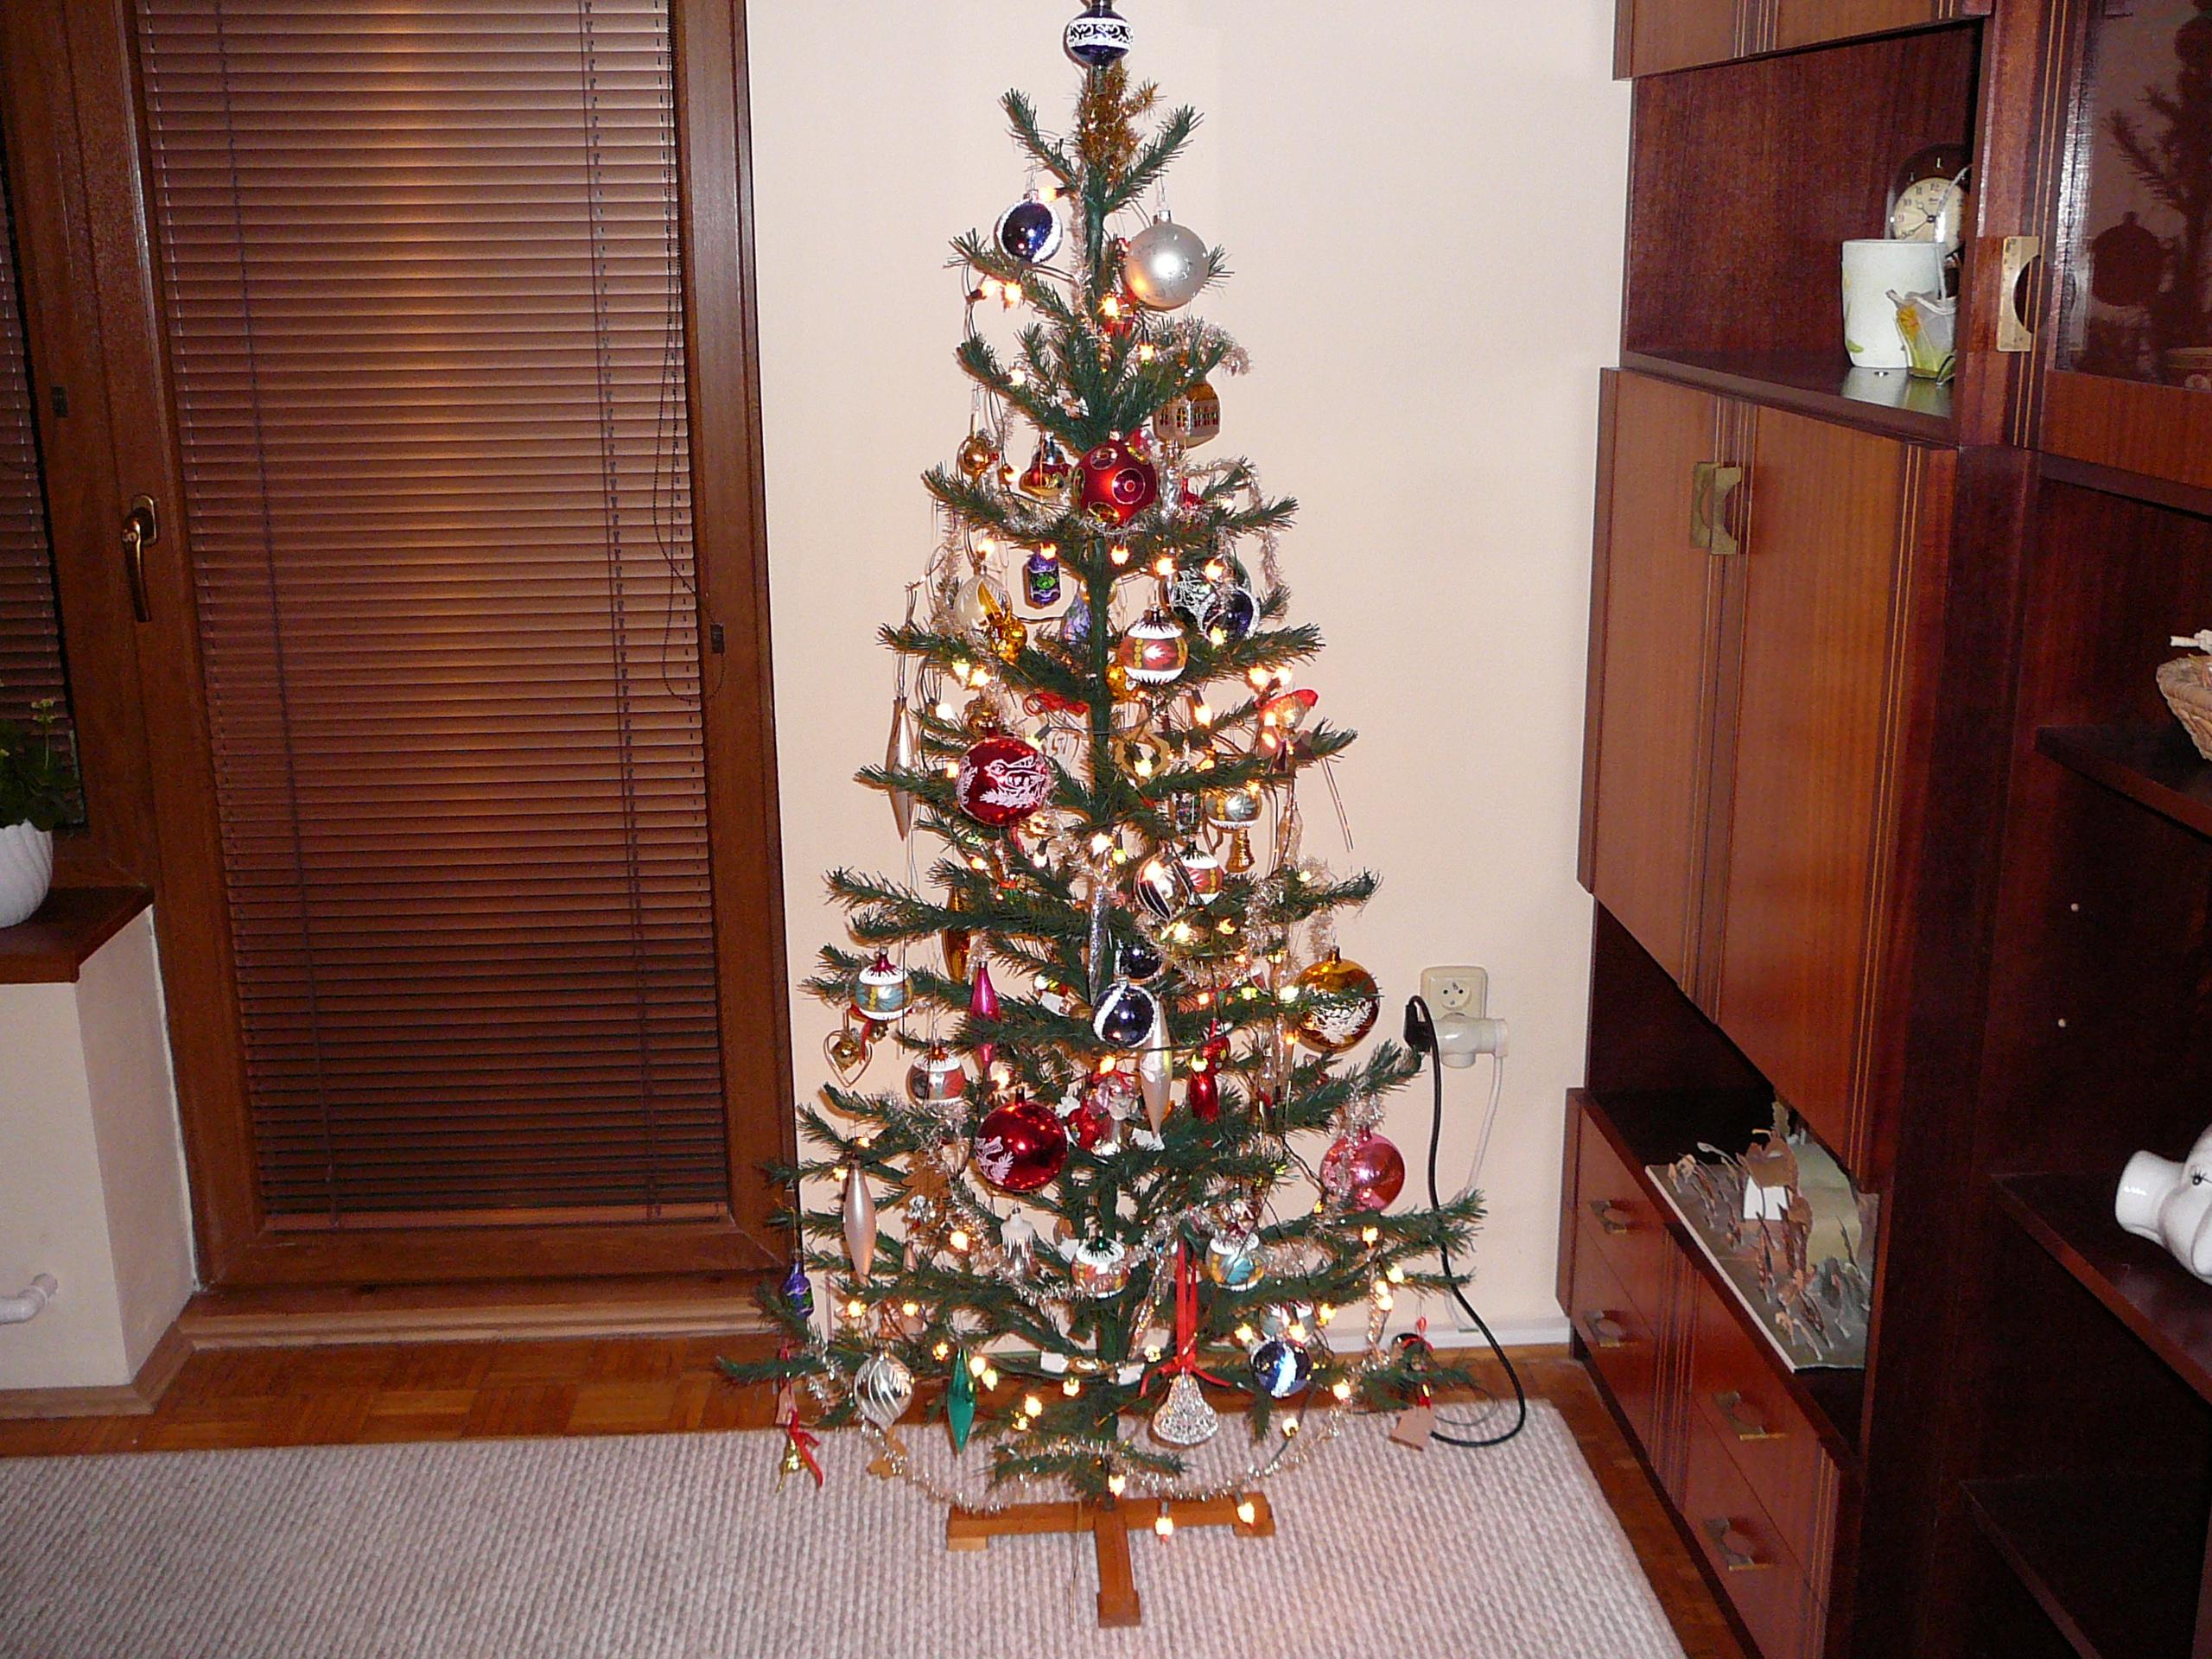 File:Kitsch Christmas tree.jpg - Wikimedia Commons